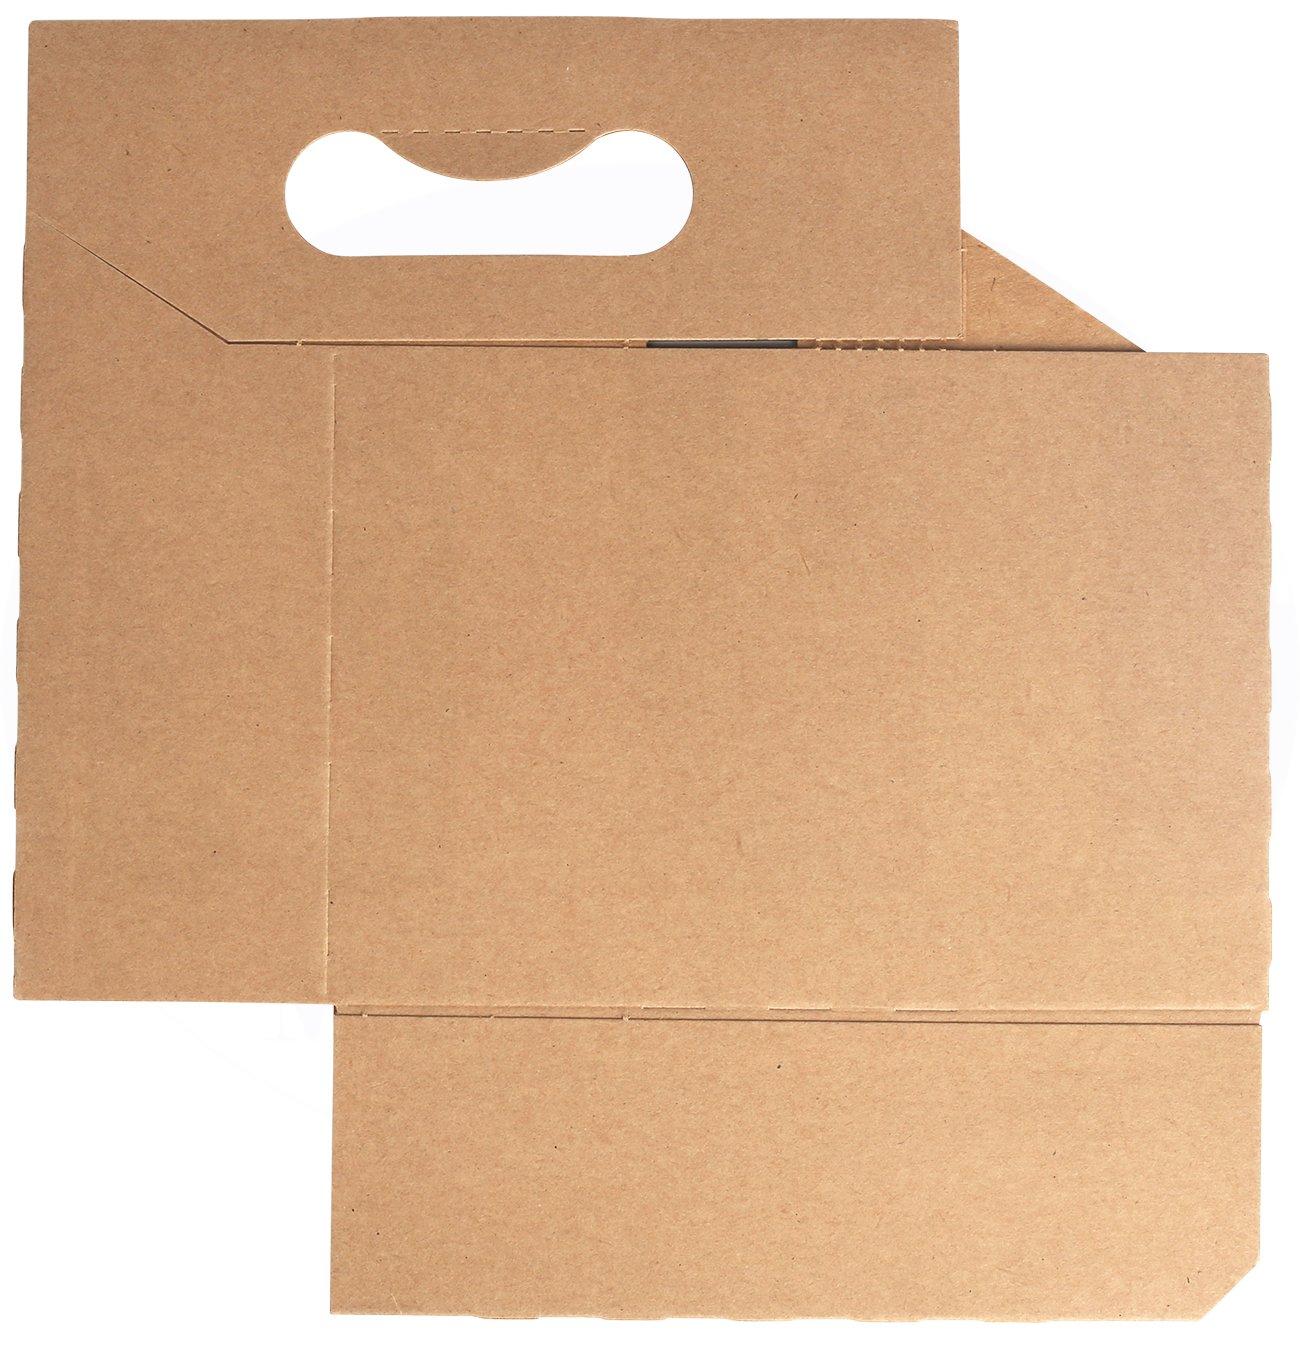 6 Bottle Holder Kraft Cardboard 12 oz. Beer or Soda Bottle Carrier for Safe And Easy Transport, 6 pack carrier by MT Products – (10 Pieces)